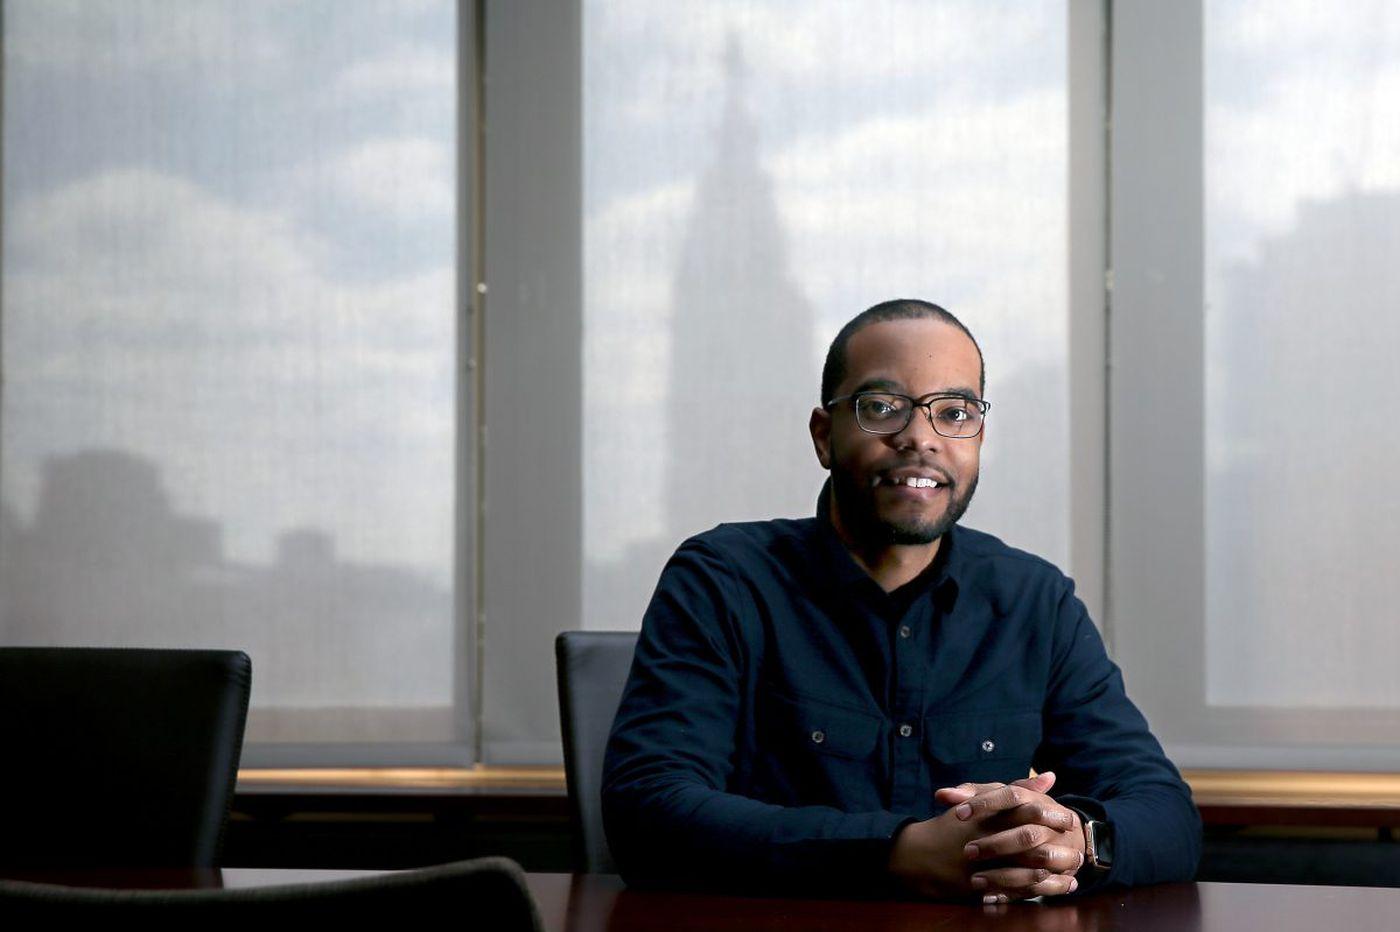 To address shortage of black doctors, Drexel medical students create mentoring network